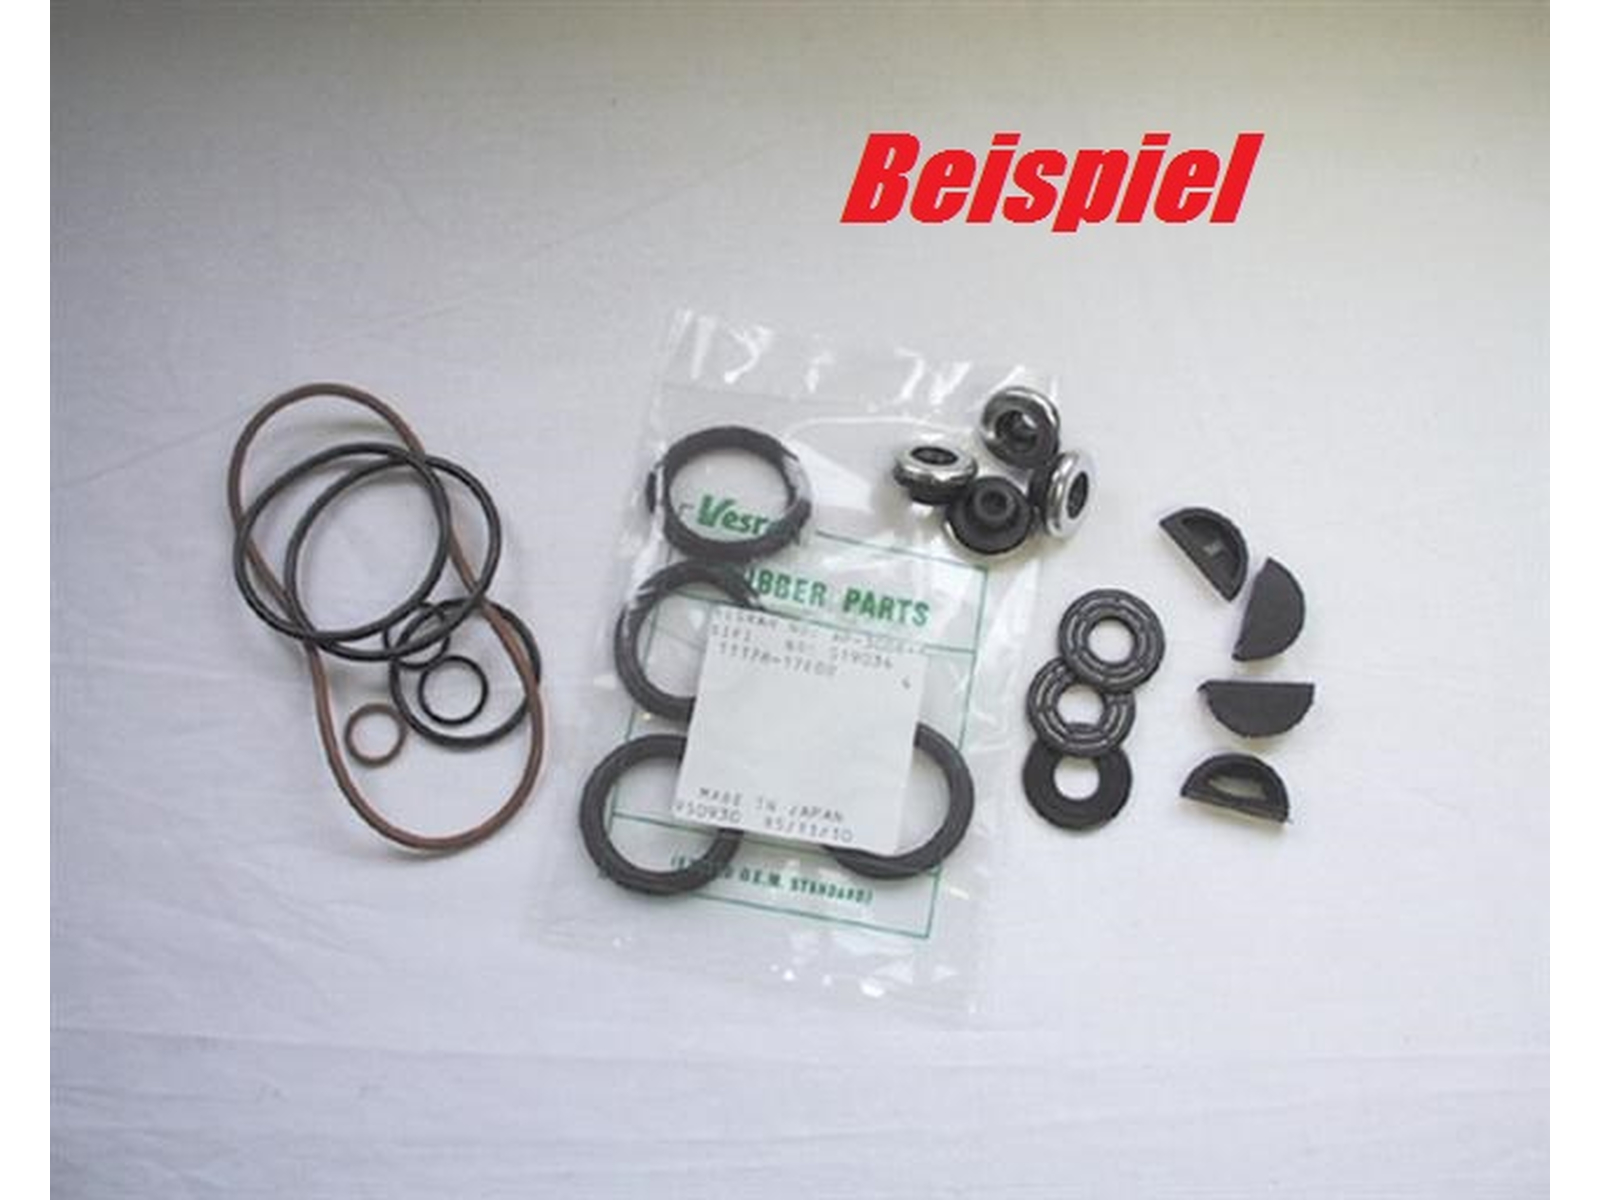 Ventildeckeldichtung Kawasaki Zr 550 B1-Zephyr